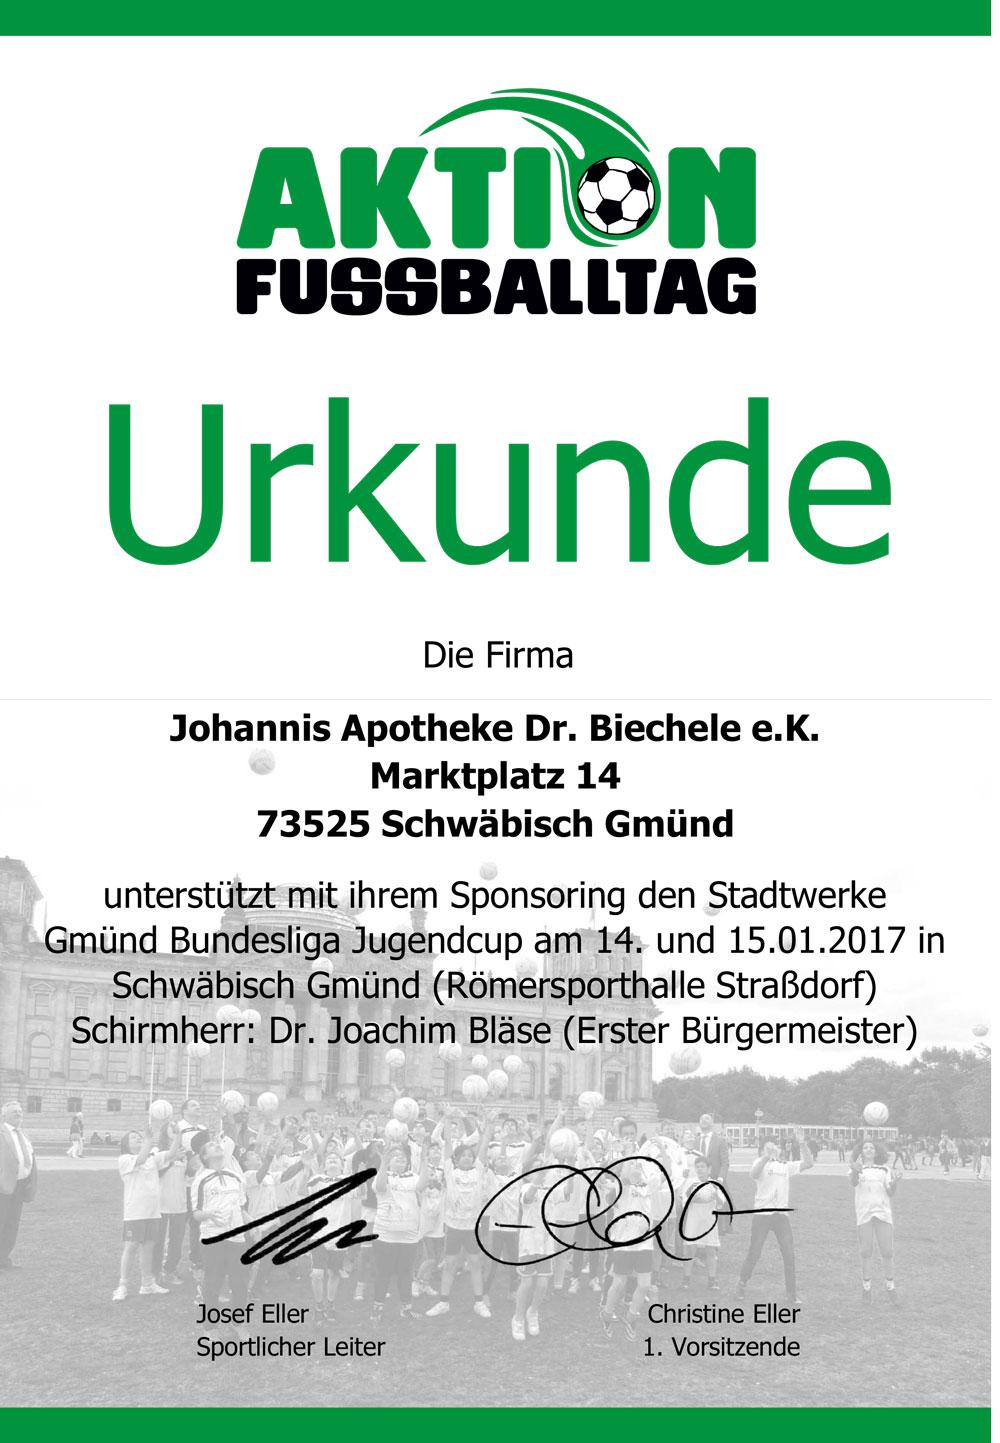 urkunde-aktion-fussballtag